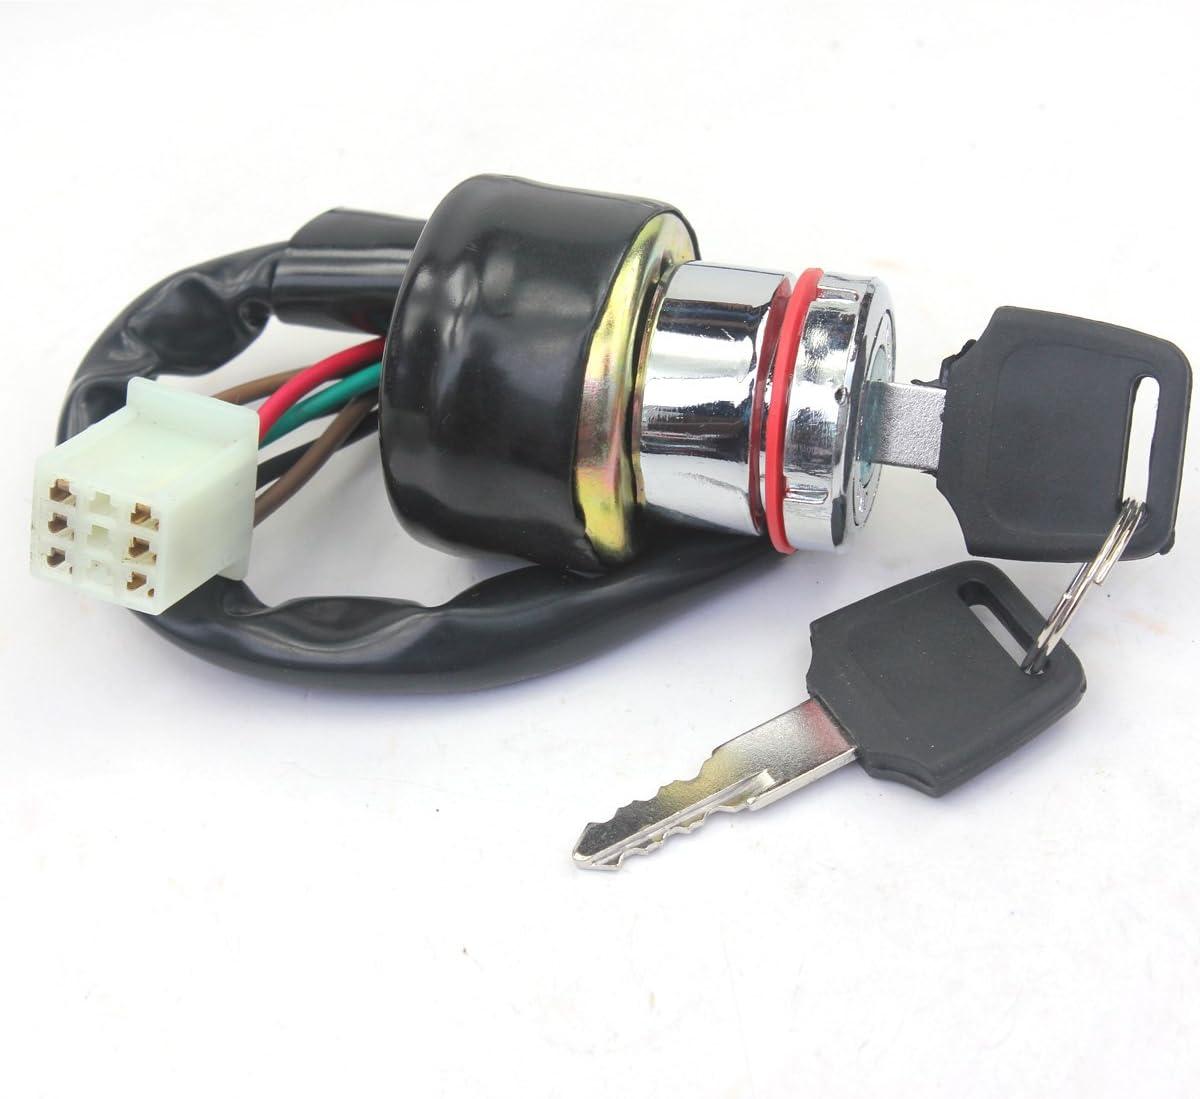 Wingsmoto Ignition Key Switch 6 Wires 90cc 125cc 150cc Gokart ATV Dirt Pit Bike